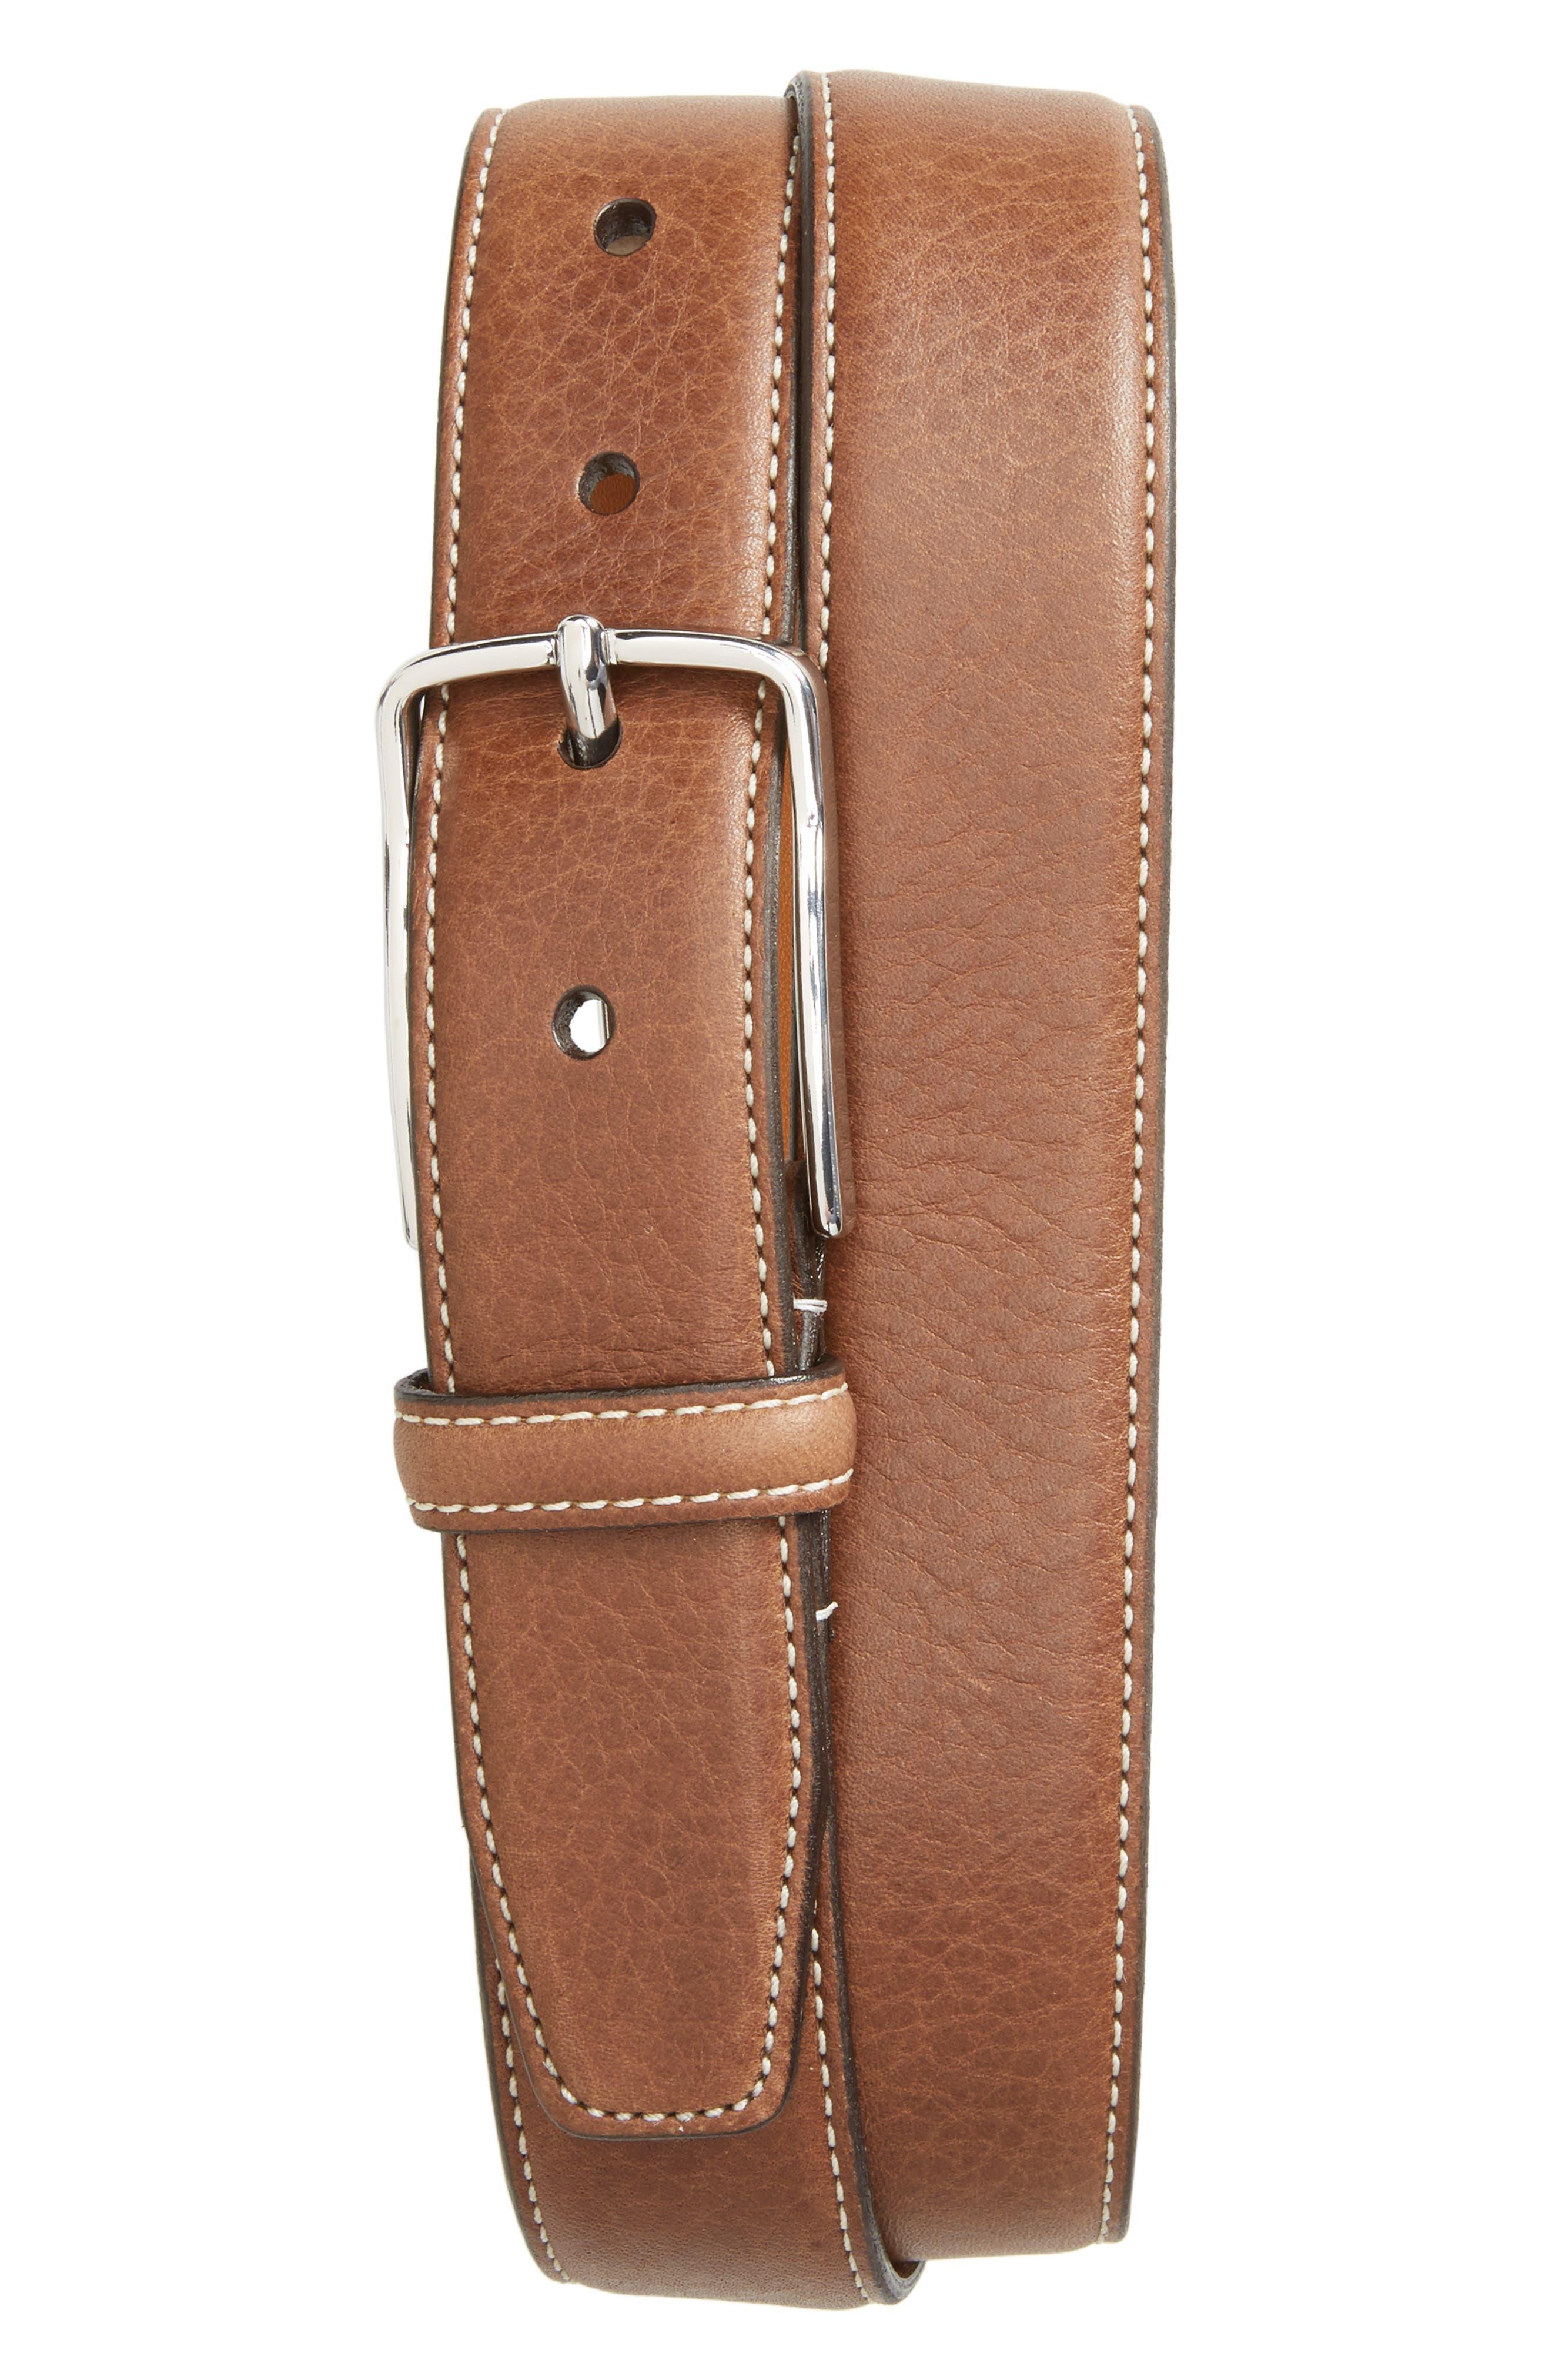 Marlin Leather Belt,                             Main thumbnail 1, color,                             210